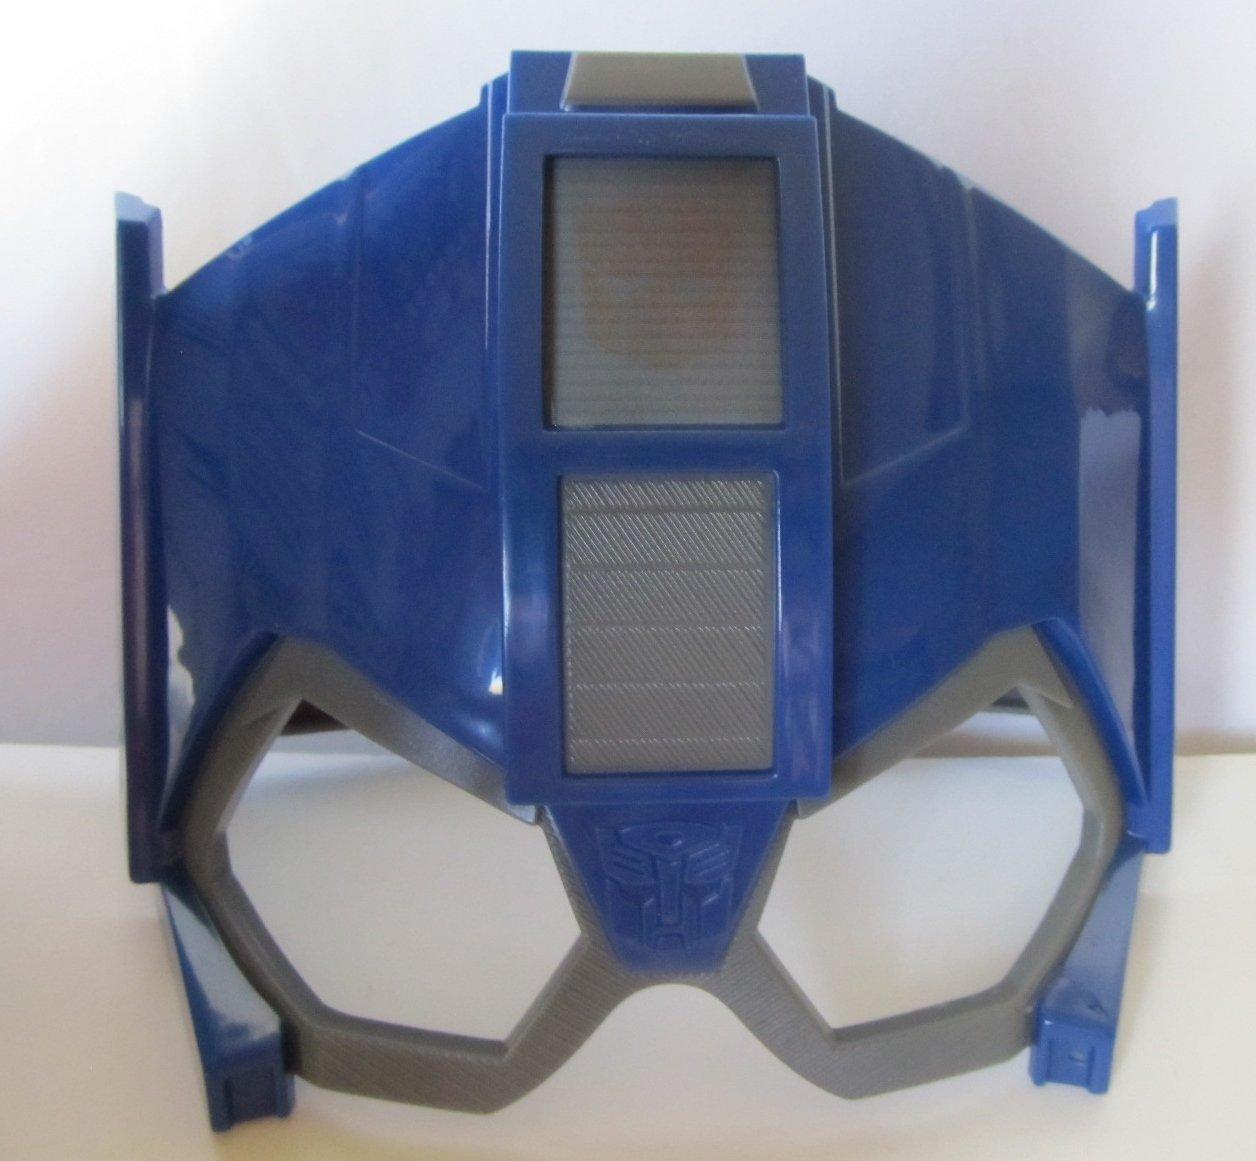 Amazon.com: Transformers Optimus Prime Mask #4 McDonalds 2017: Toys & Games